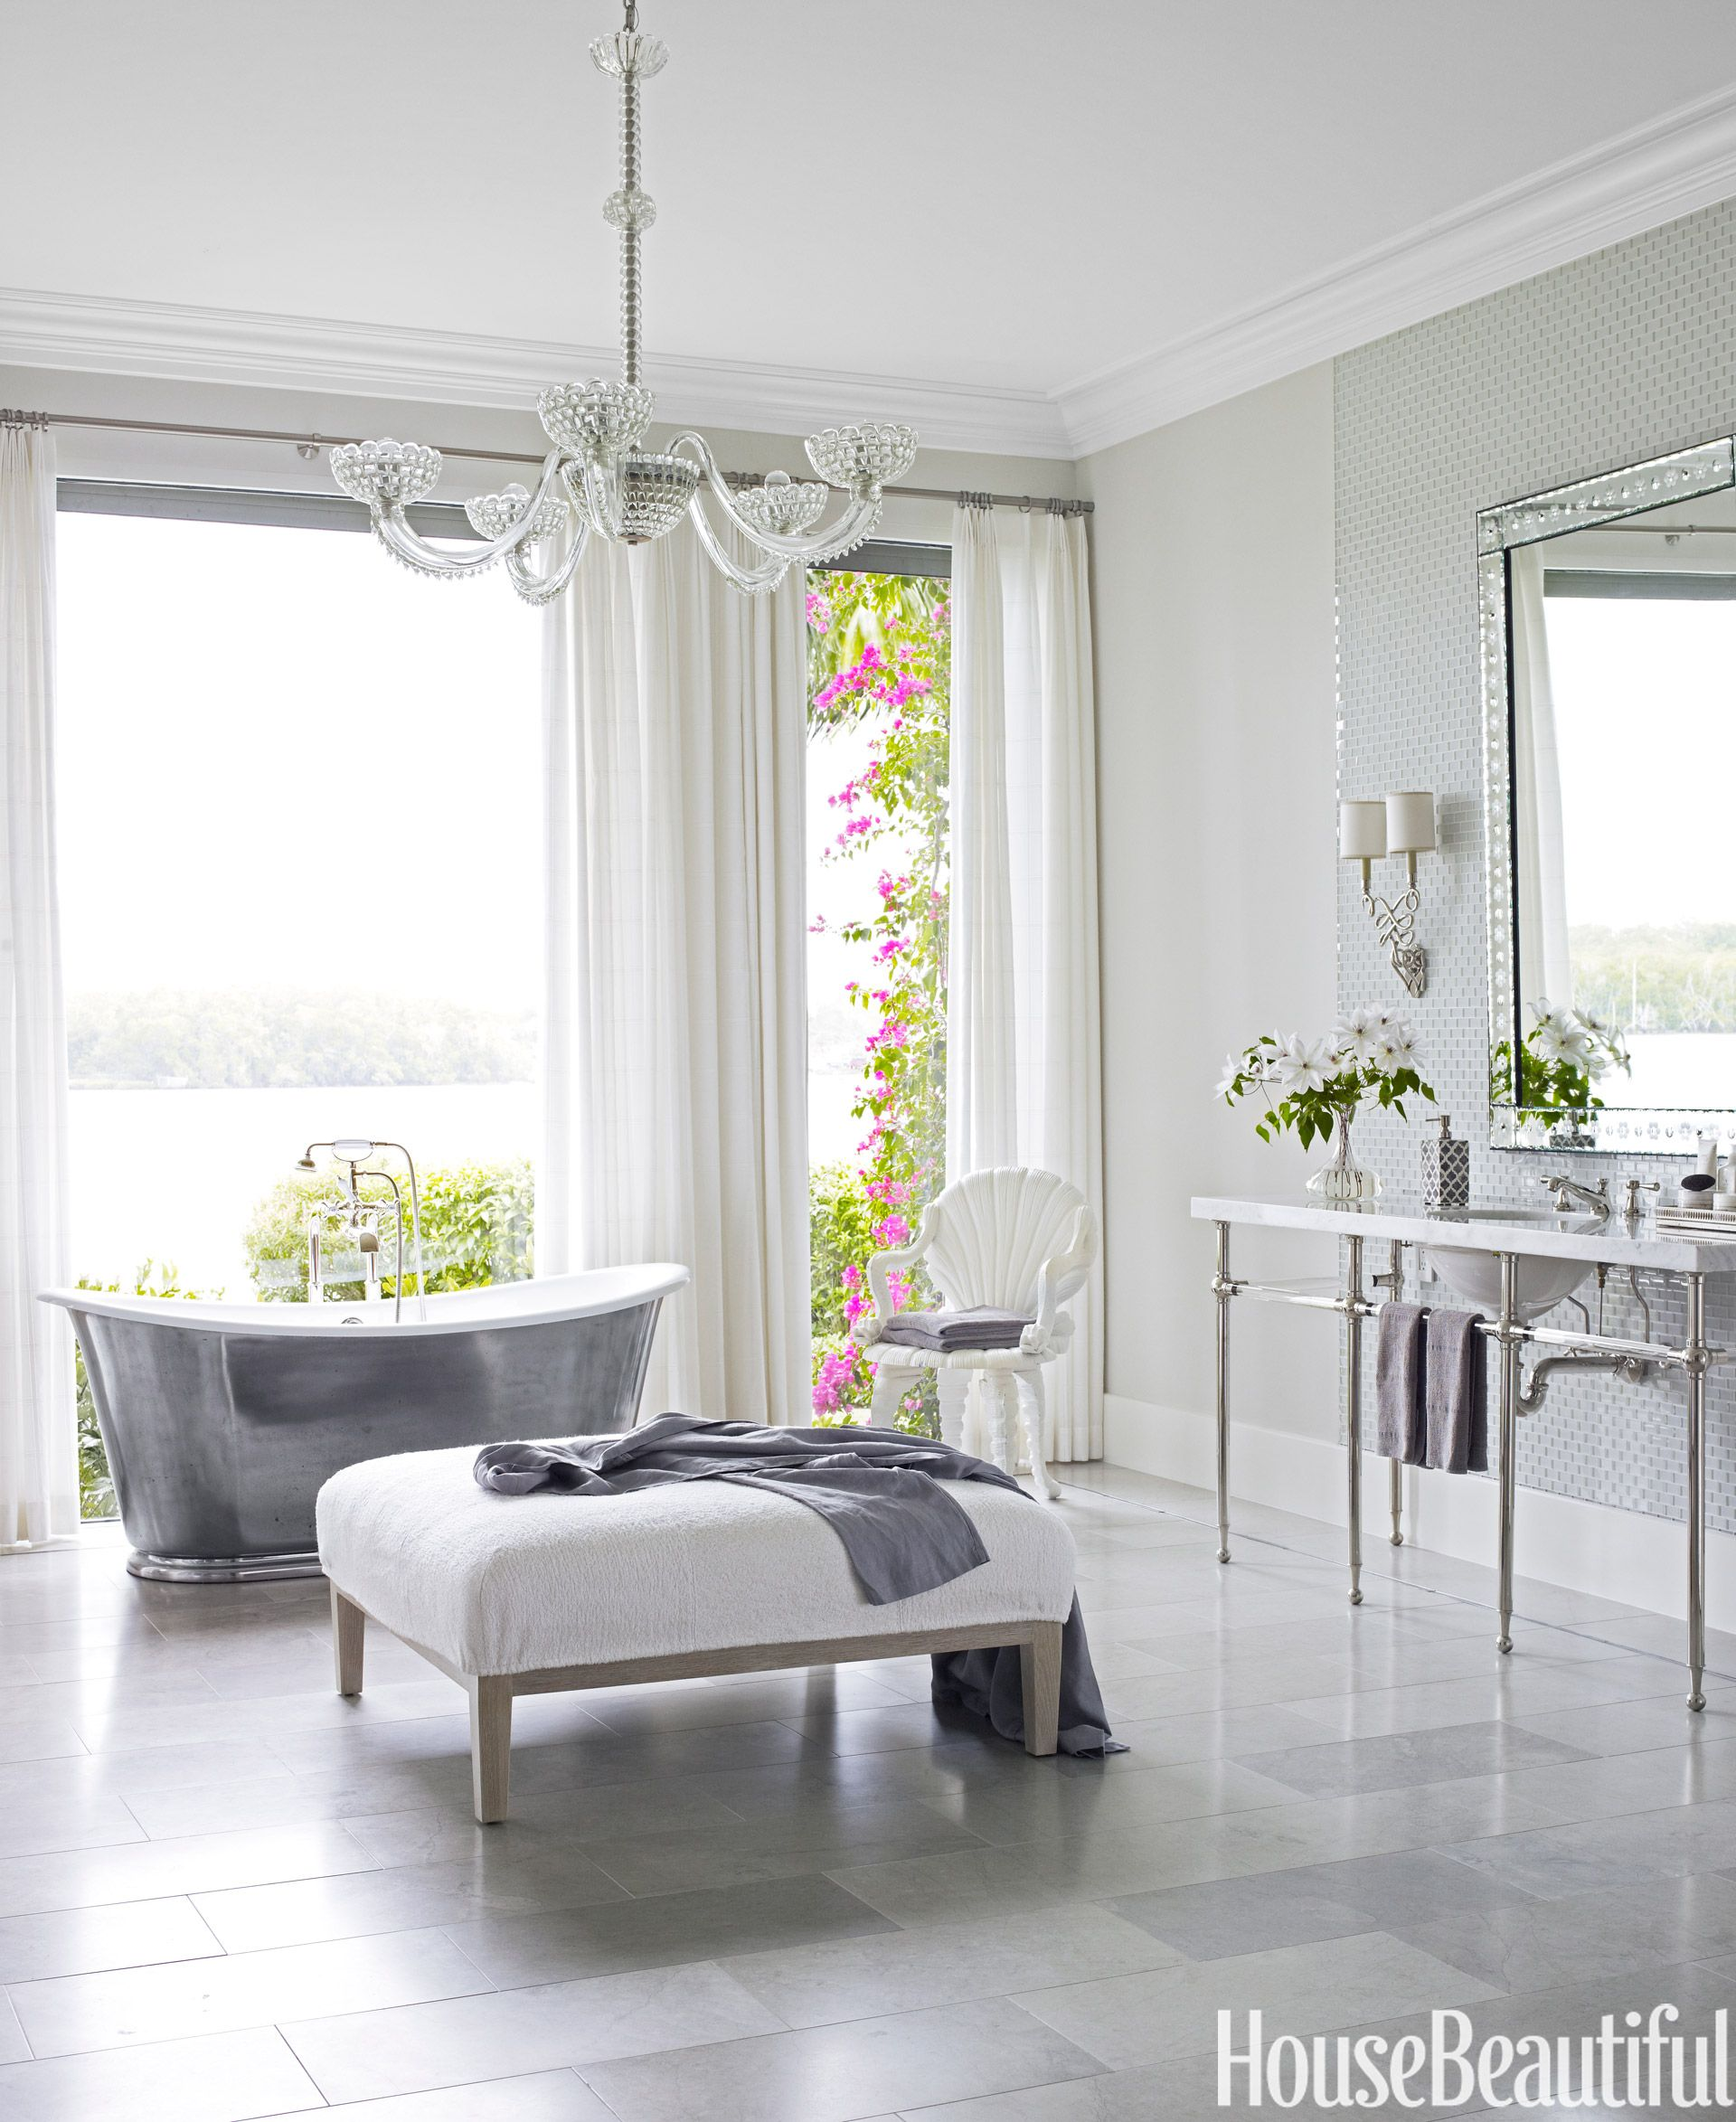 Ultra Glamorous Bathrooms - Elegant Bathrooms